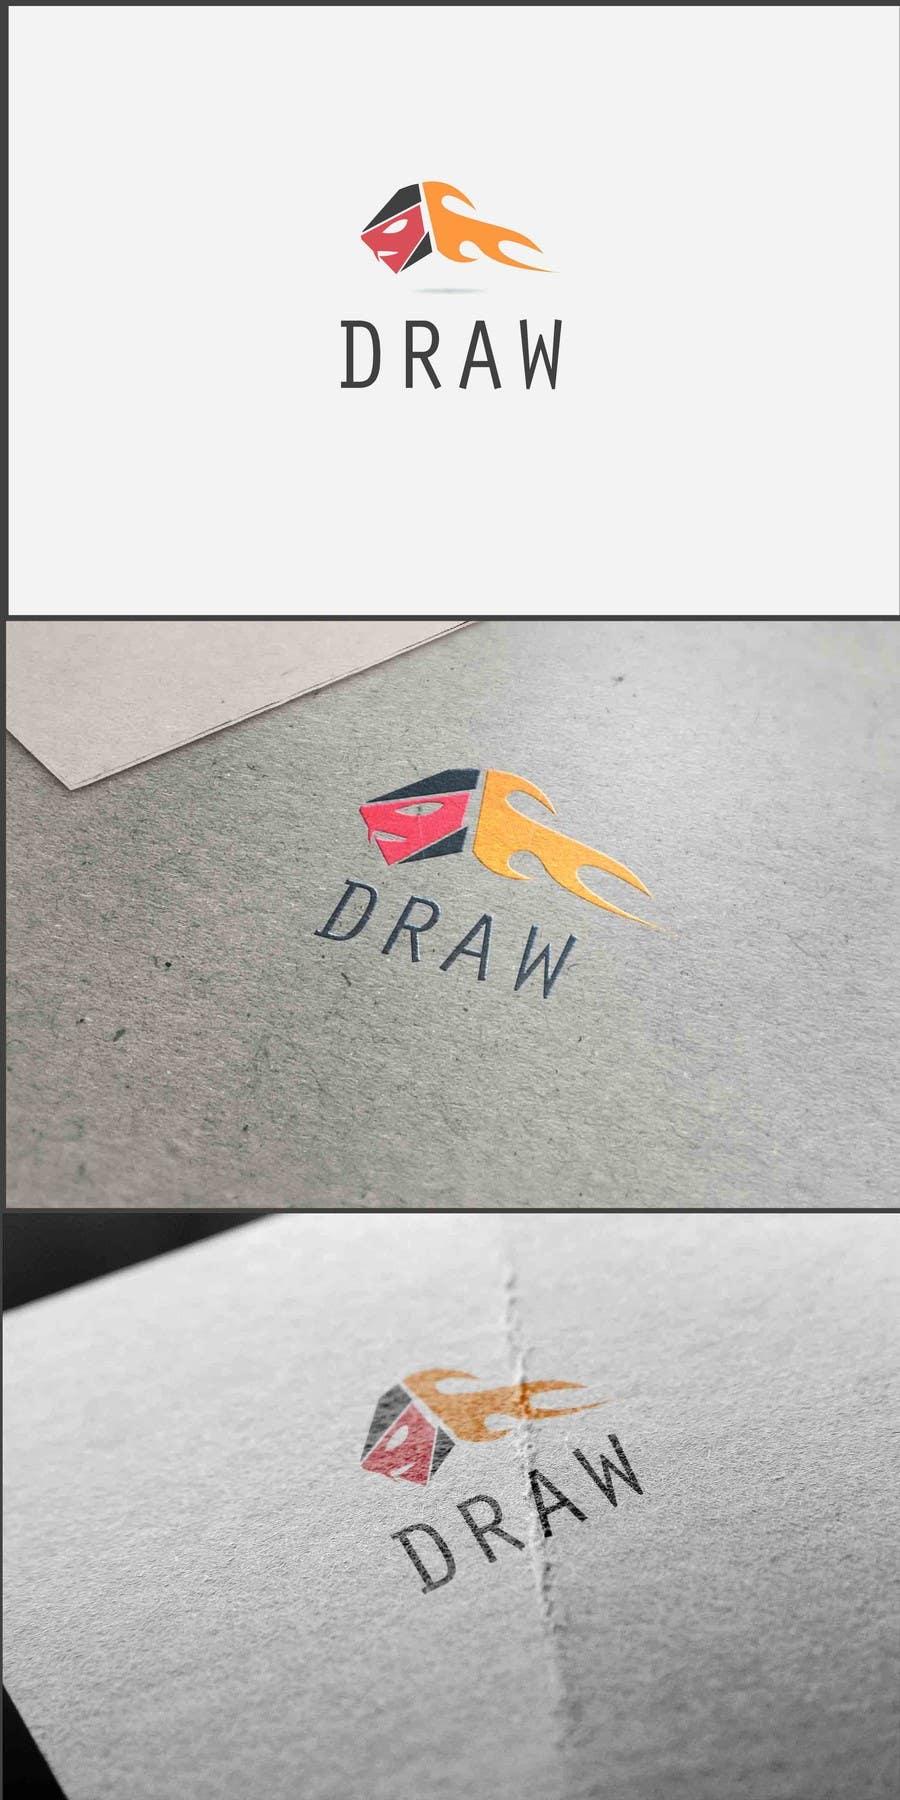 Kilpailutyö #10 kilpailussa Design a Logo for League of Legend team 'DRAW'